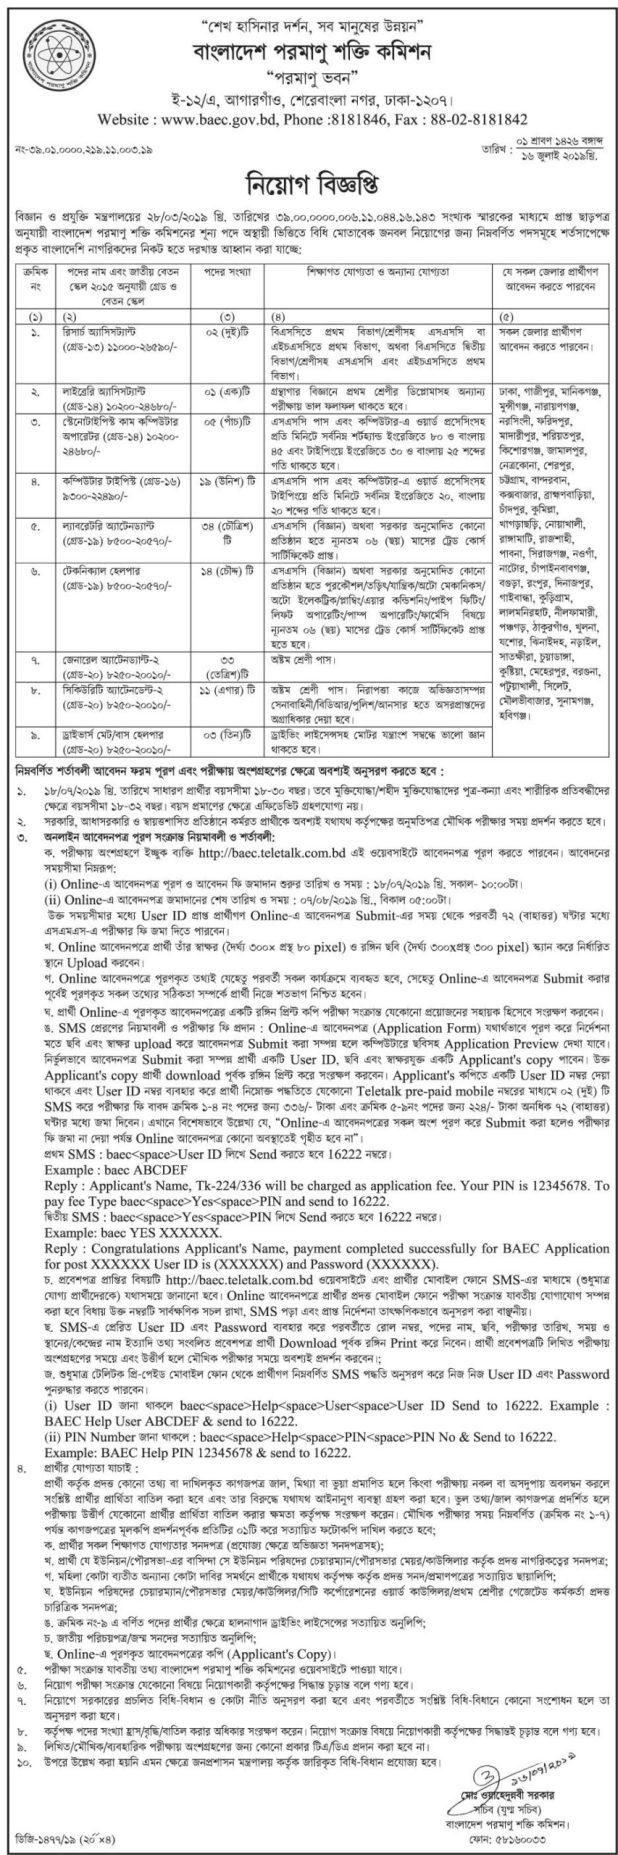 Bangladesh Atomic Energy Commission Job